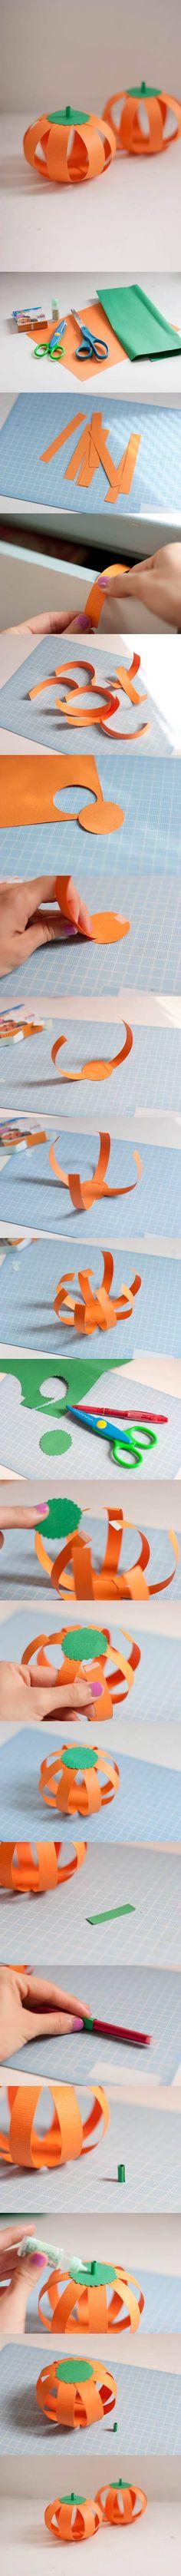 DIY Paper Halloween Pumpkin DIY Projects